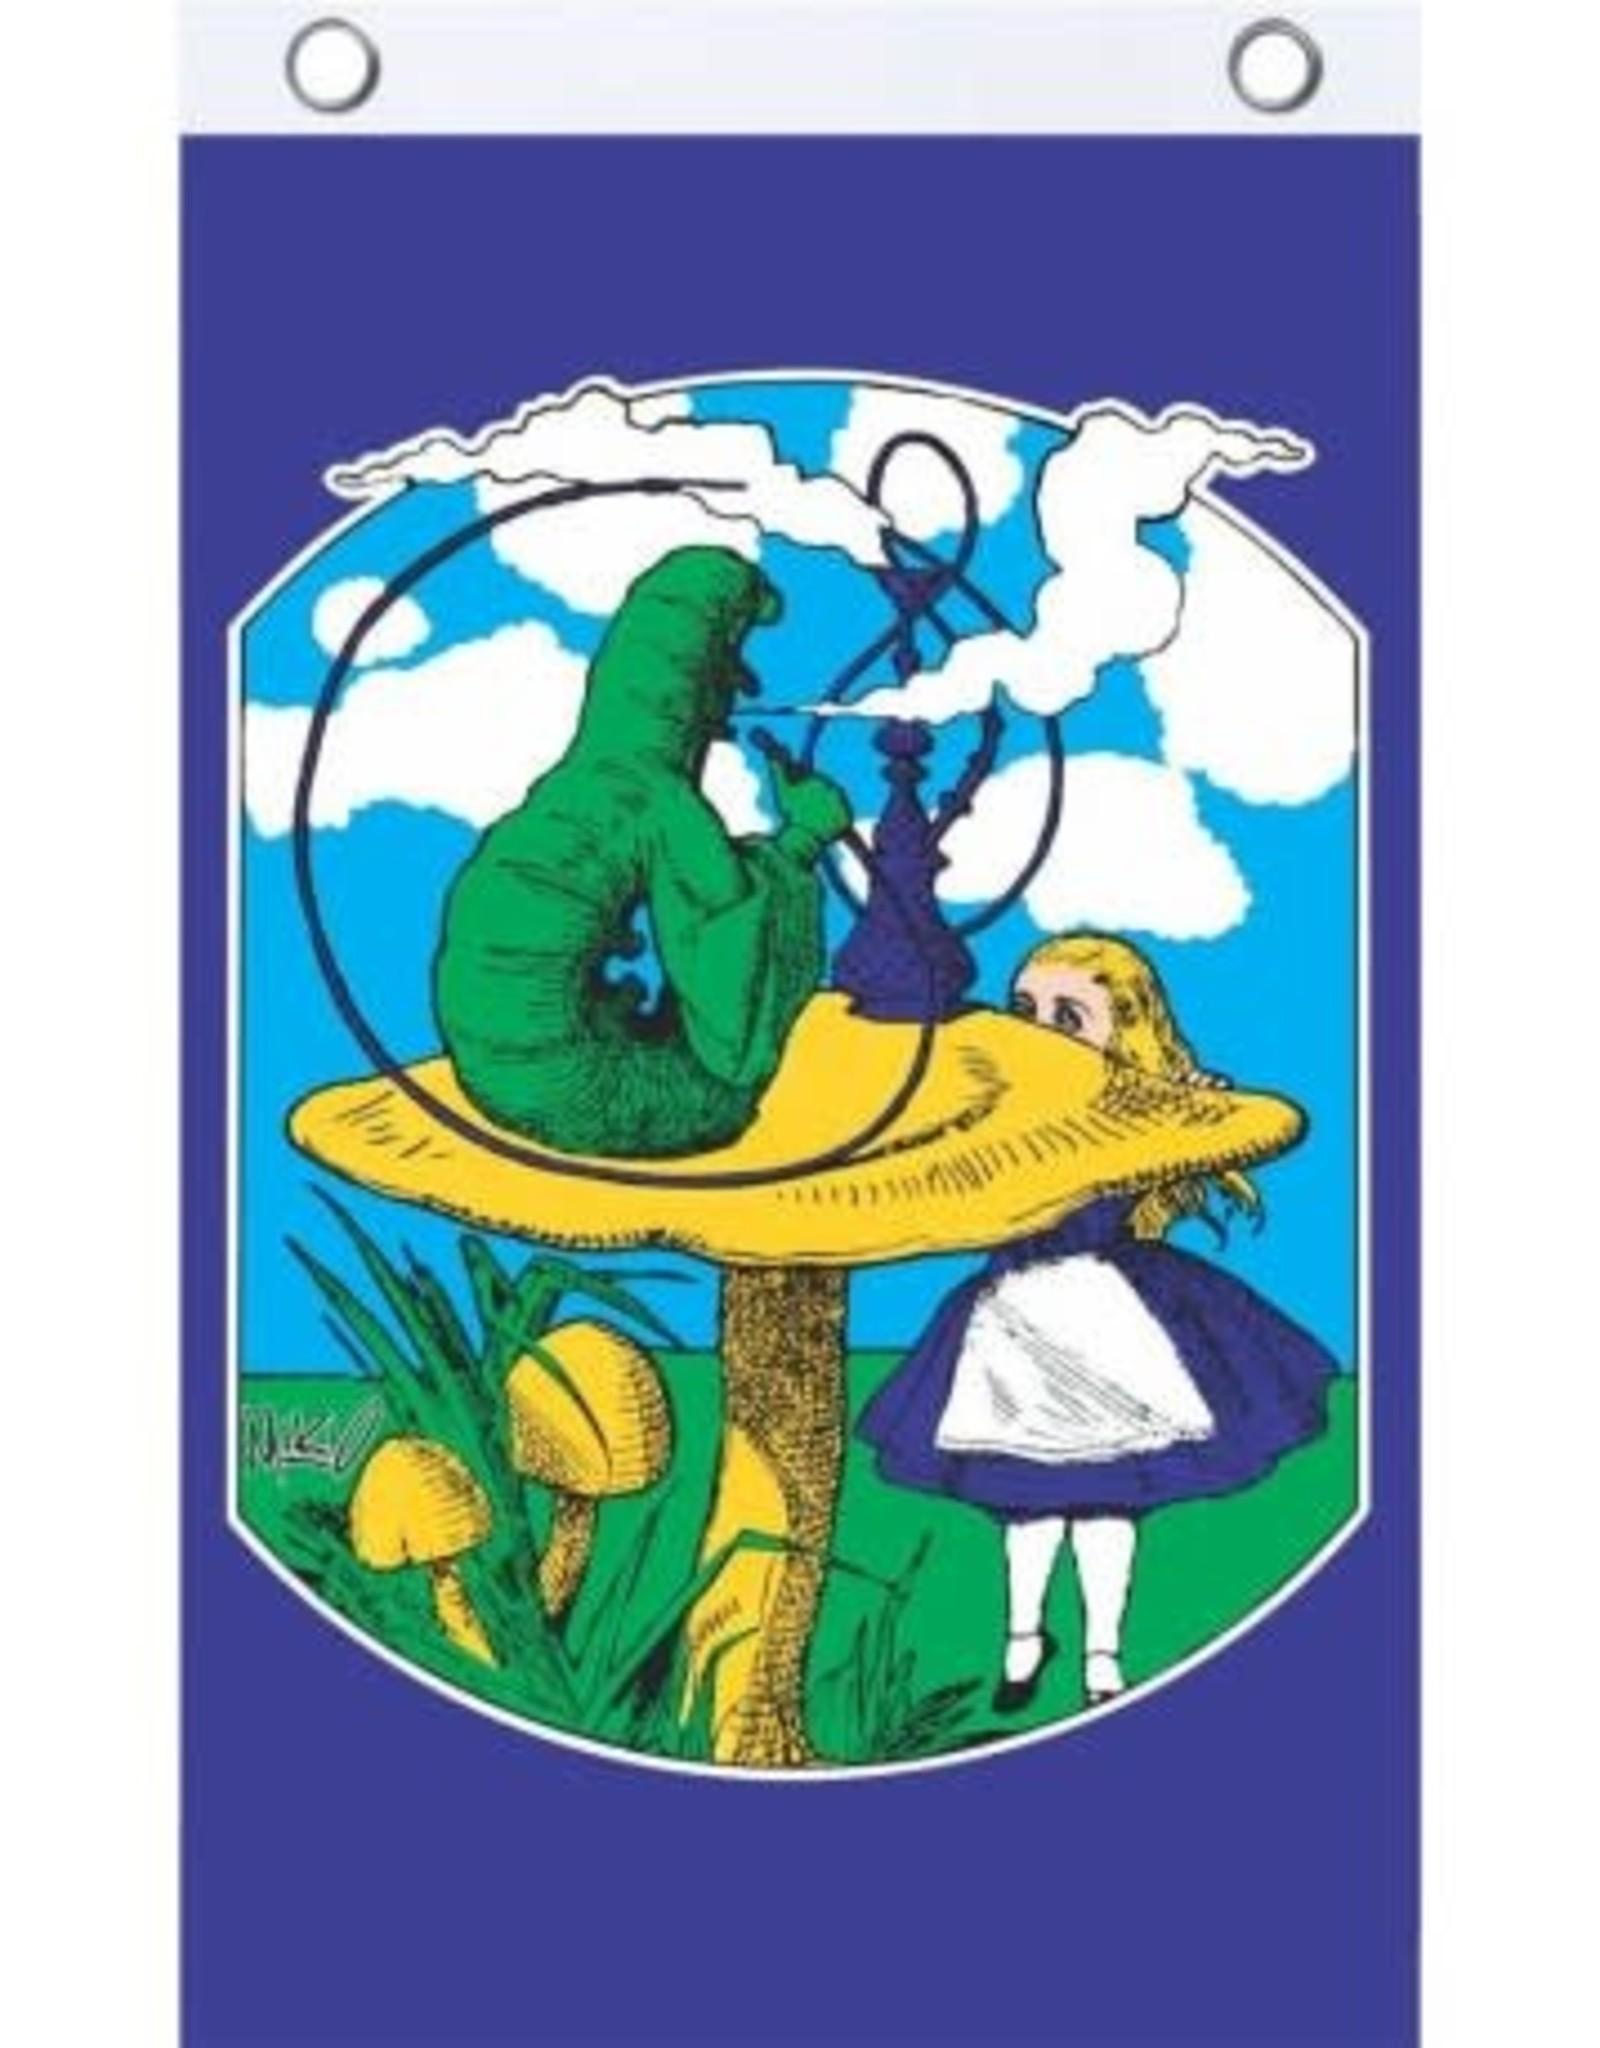 Alice in Wonderland Flag 3'x5'